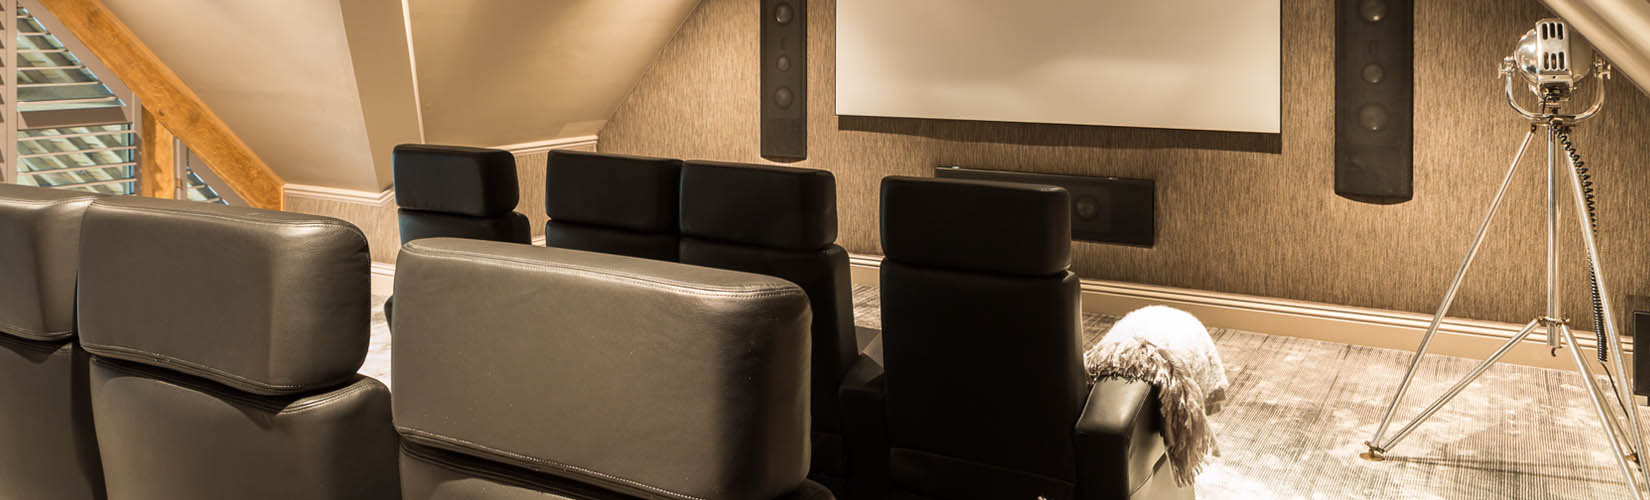 Interior Design Project: A Home Cinema Room